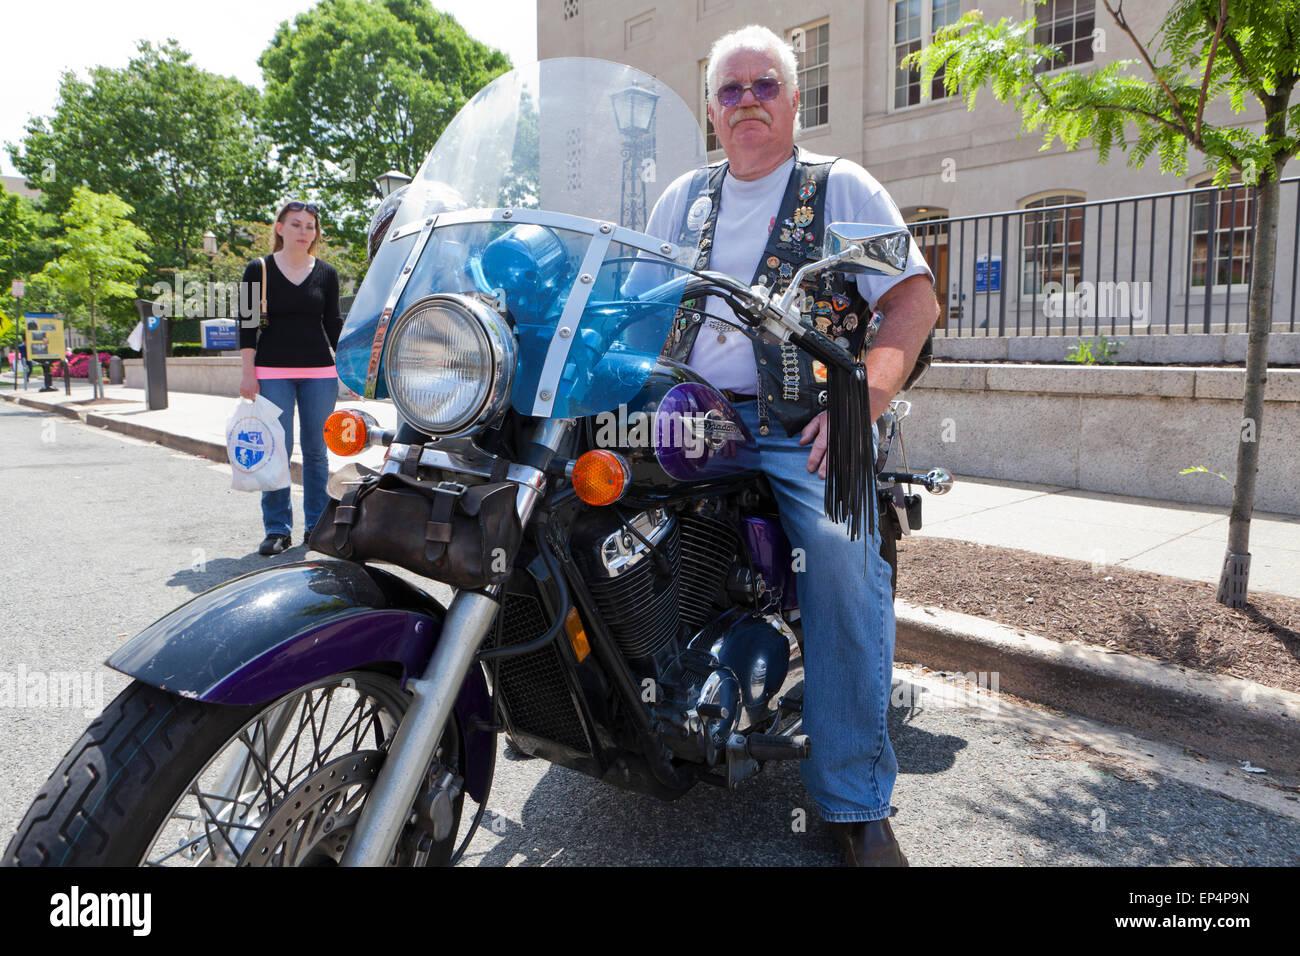 Elderly man sitting on Honda Shadow motorcycle - USA - Stock Image